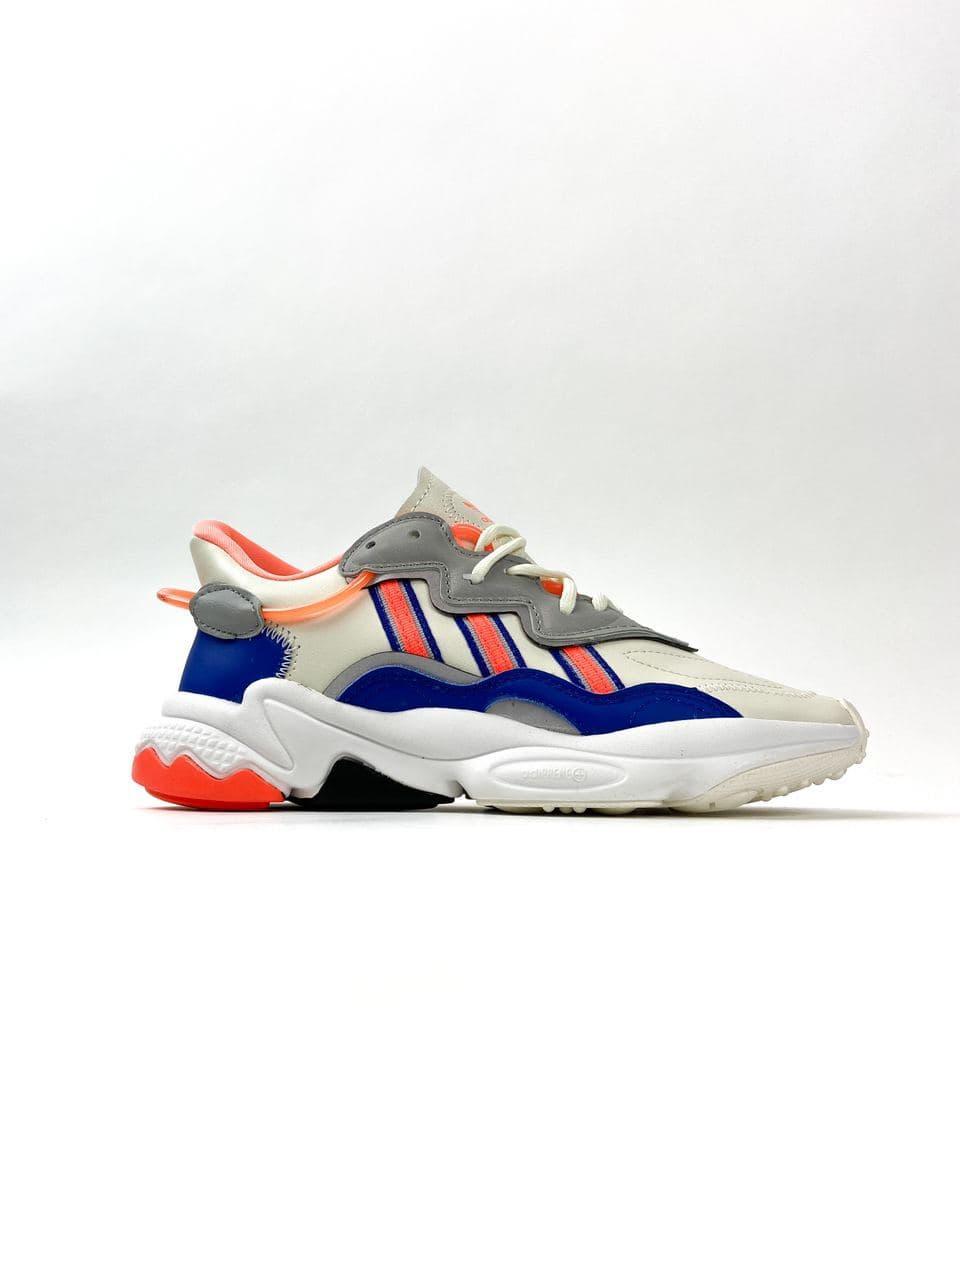 Adidas Ozweego Gray Red Blue (Бежевый)